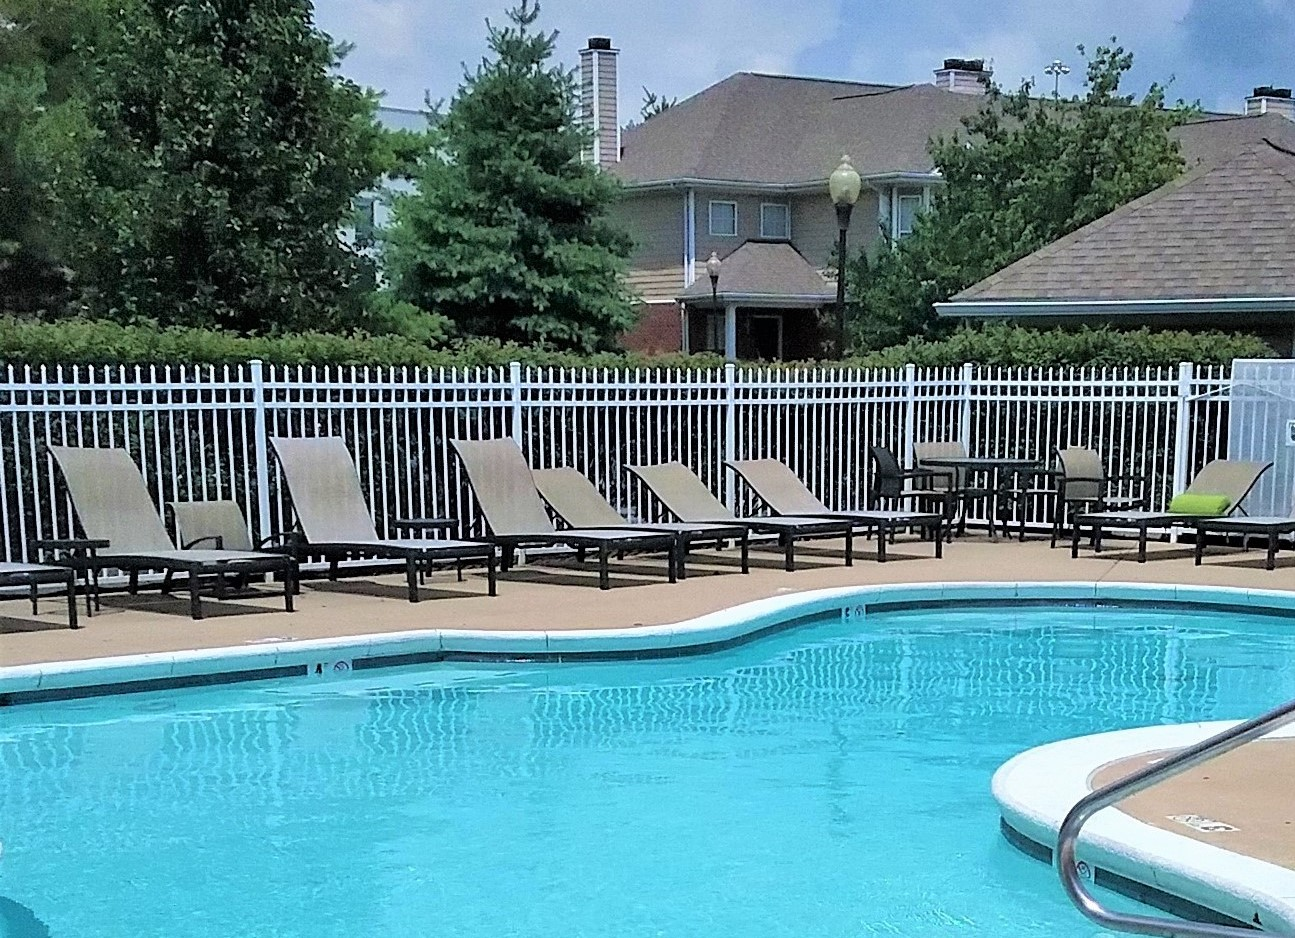 Legends Swimming Pool